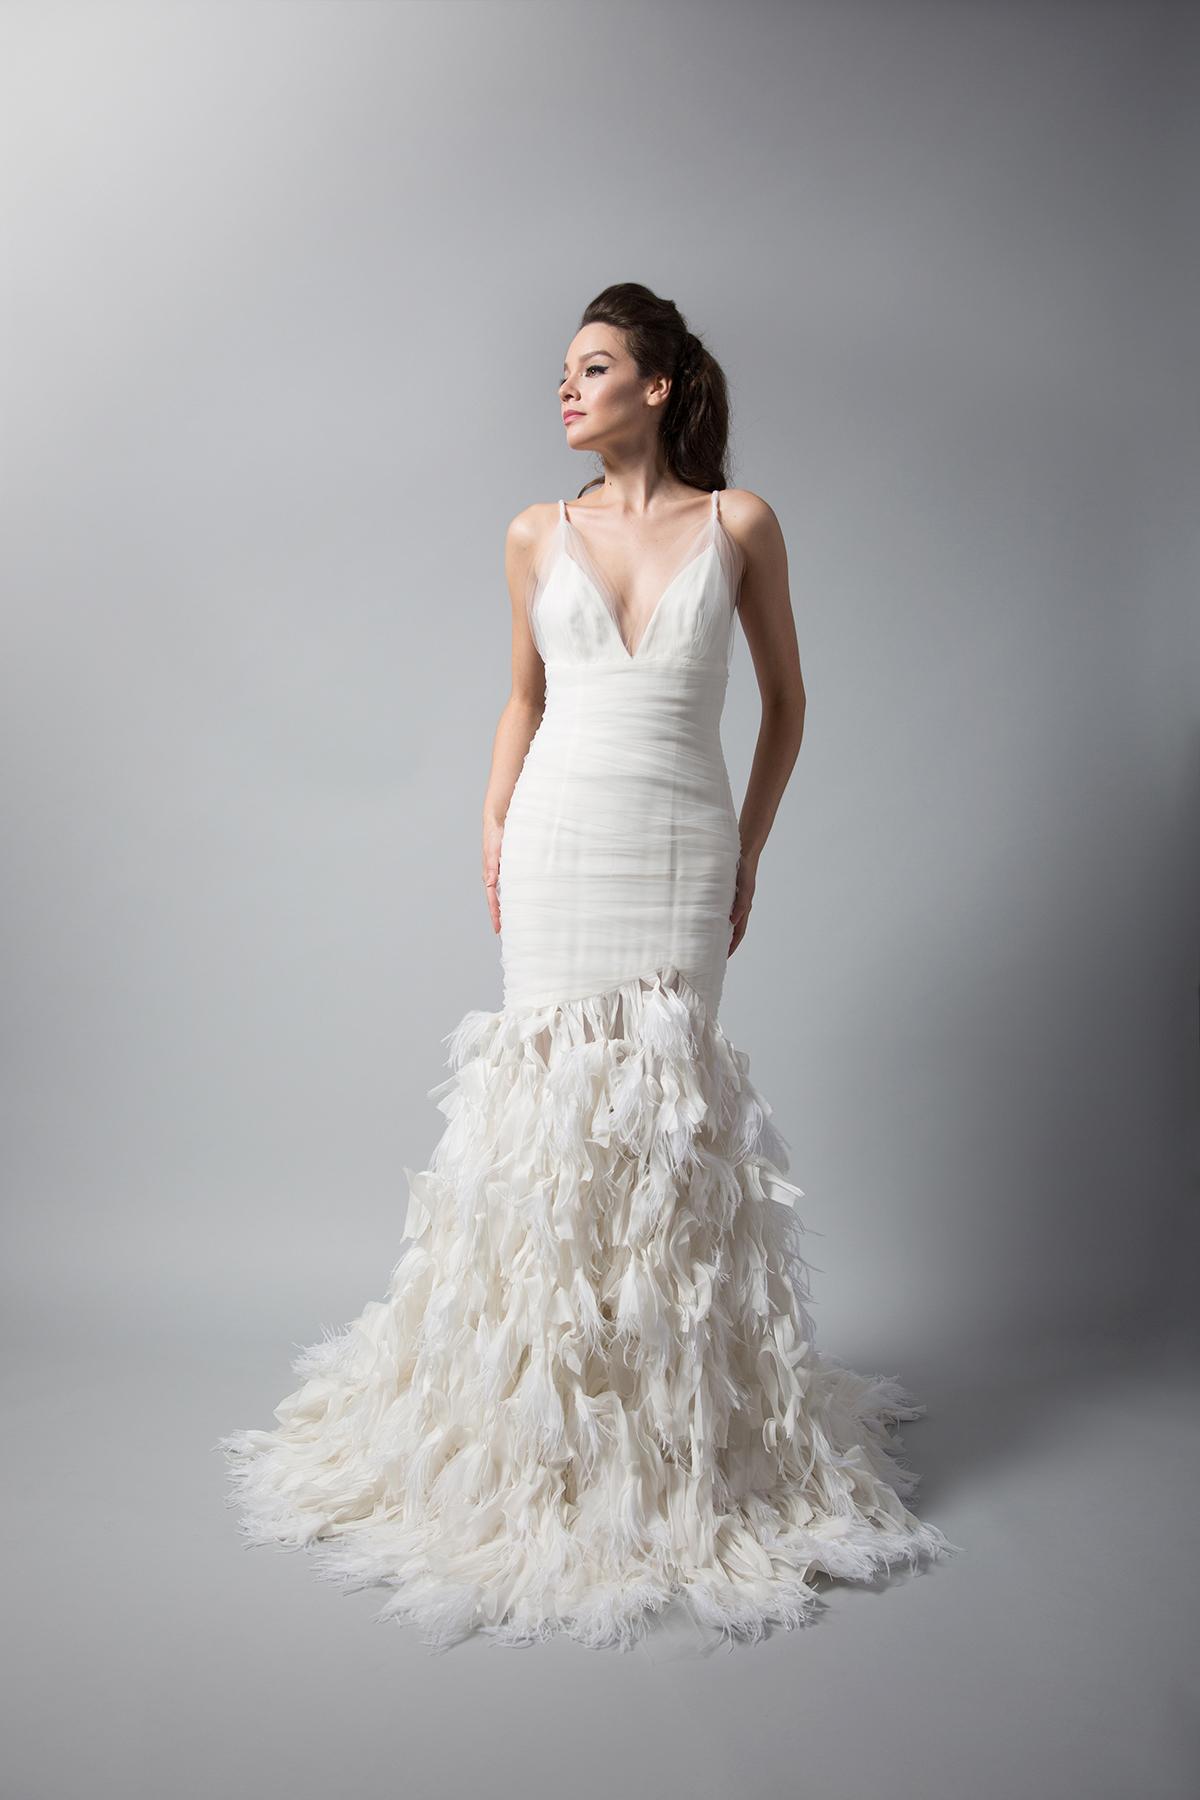 randi rahm trumpet wedding dress with spaghetti straps and feathers fall 2018